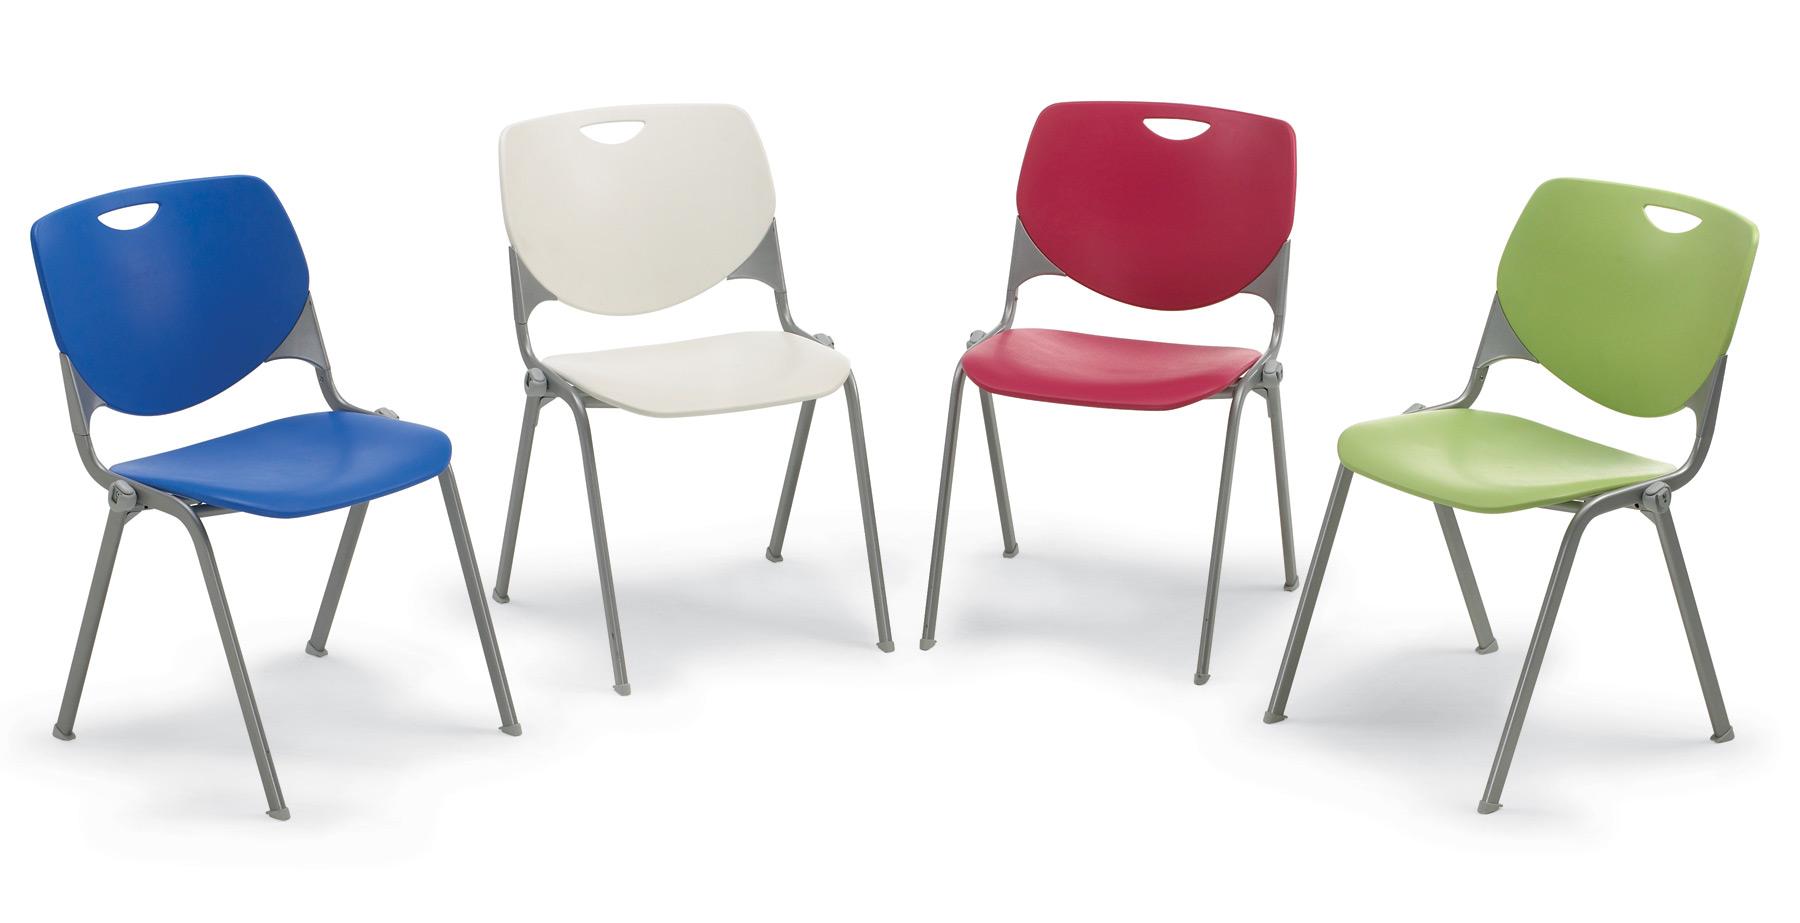 Smith System UXL Seating